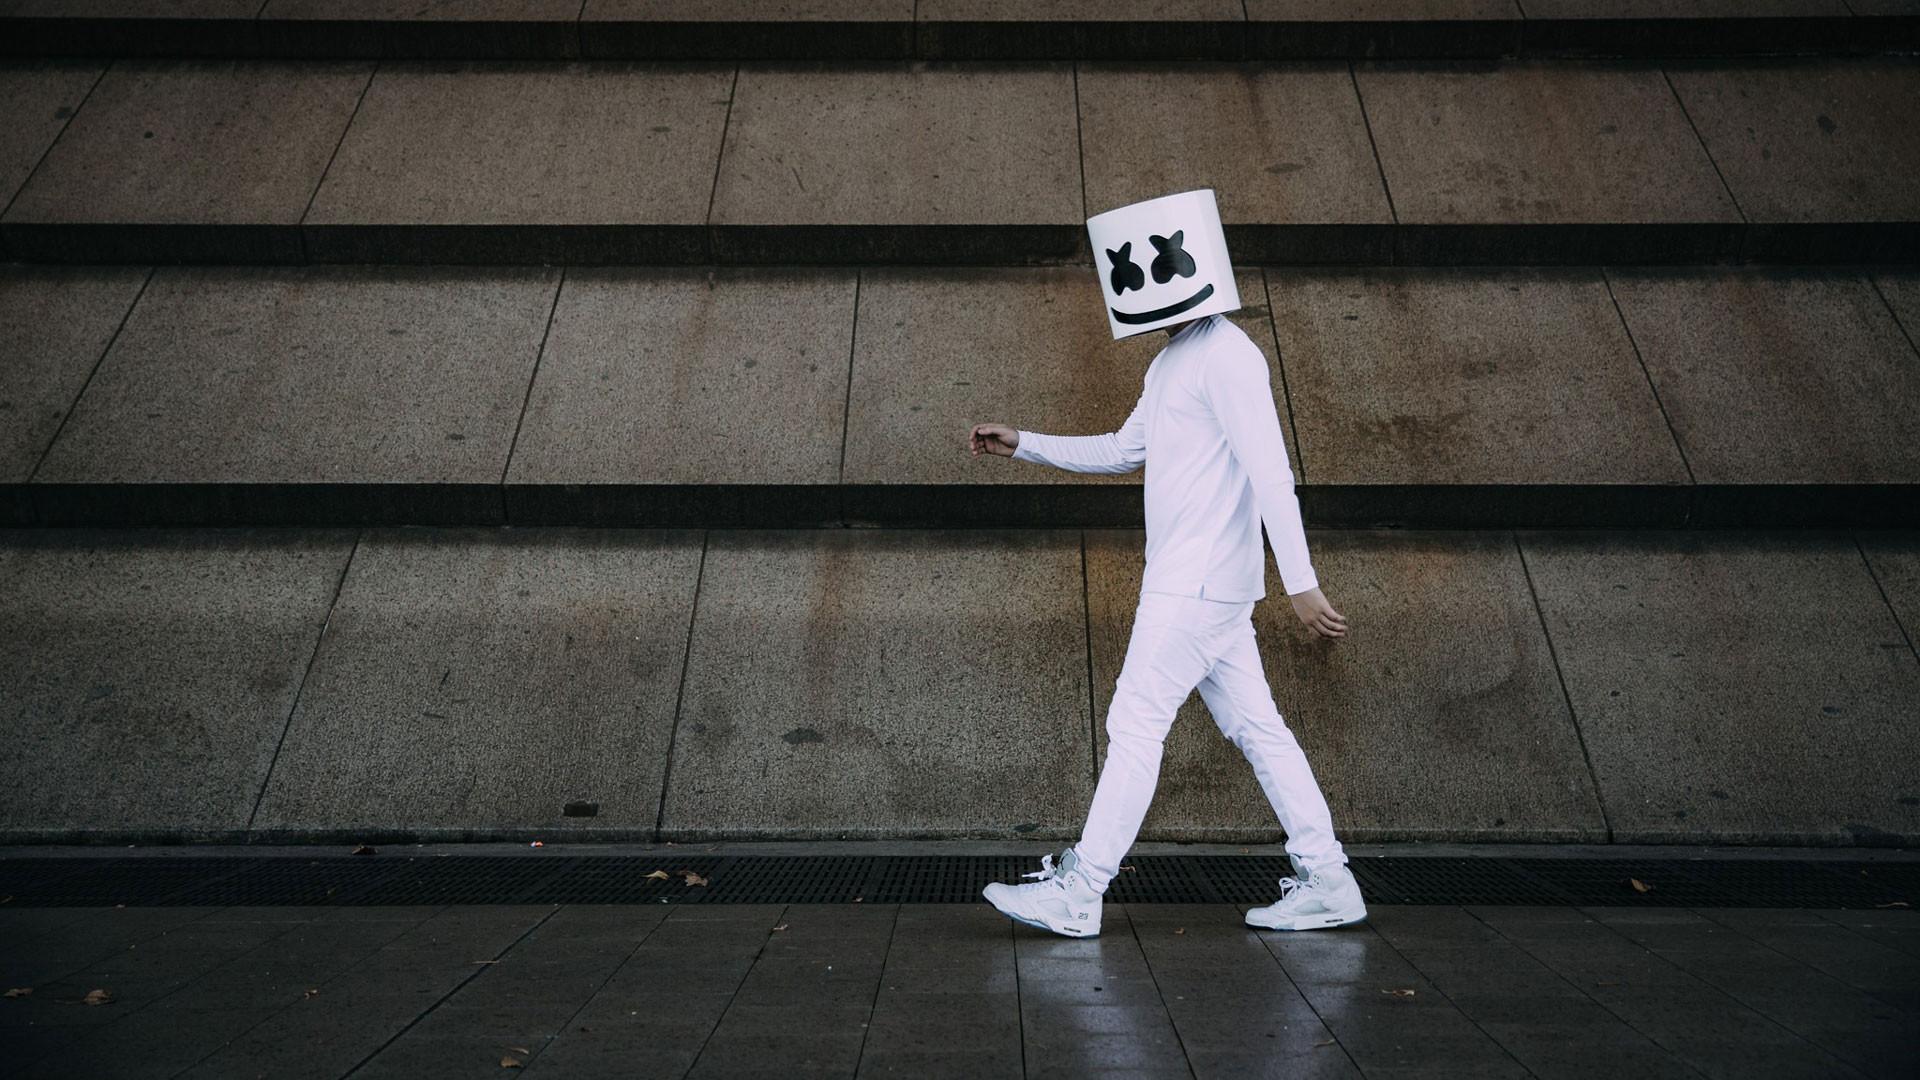 … Marshmello DJ Wallpaper in HD